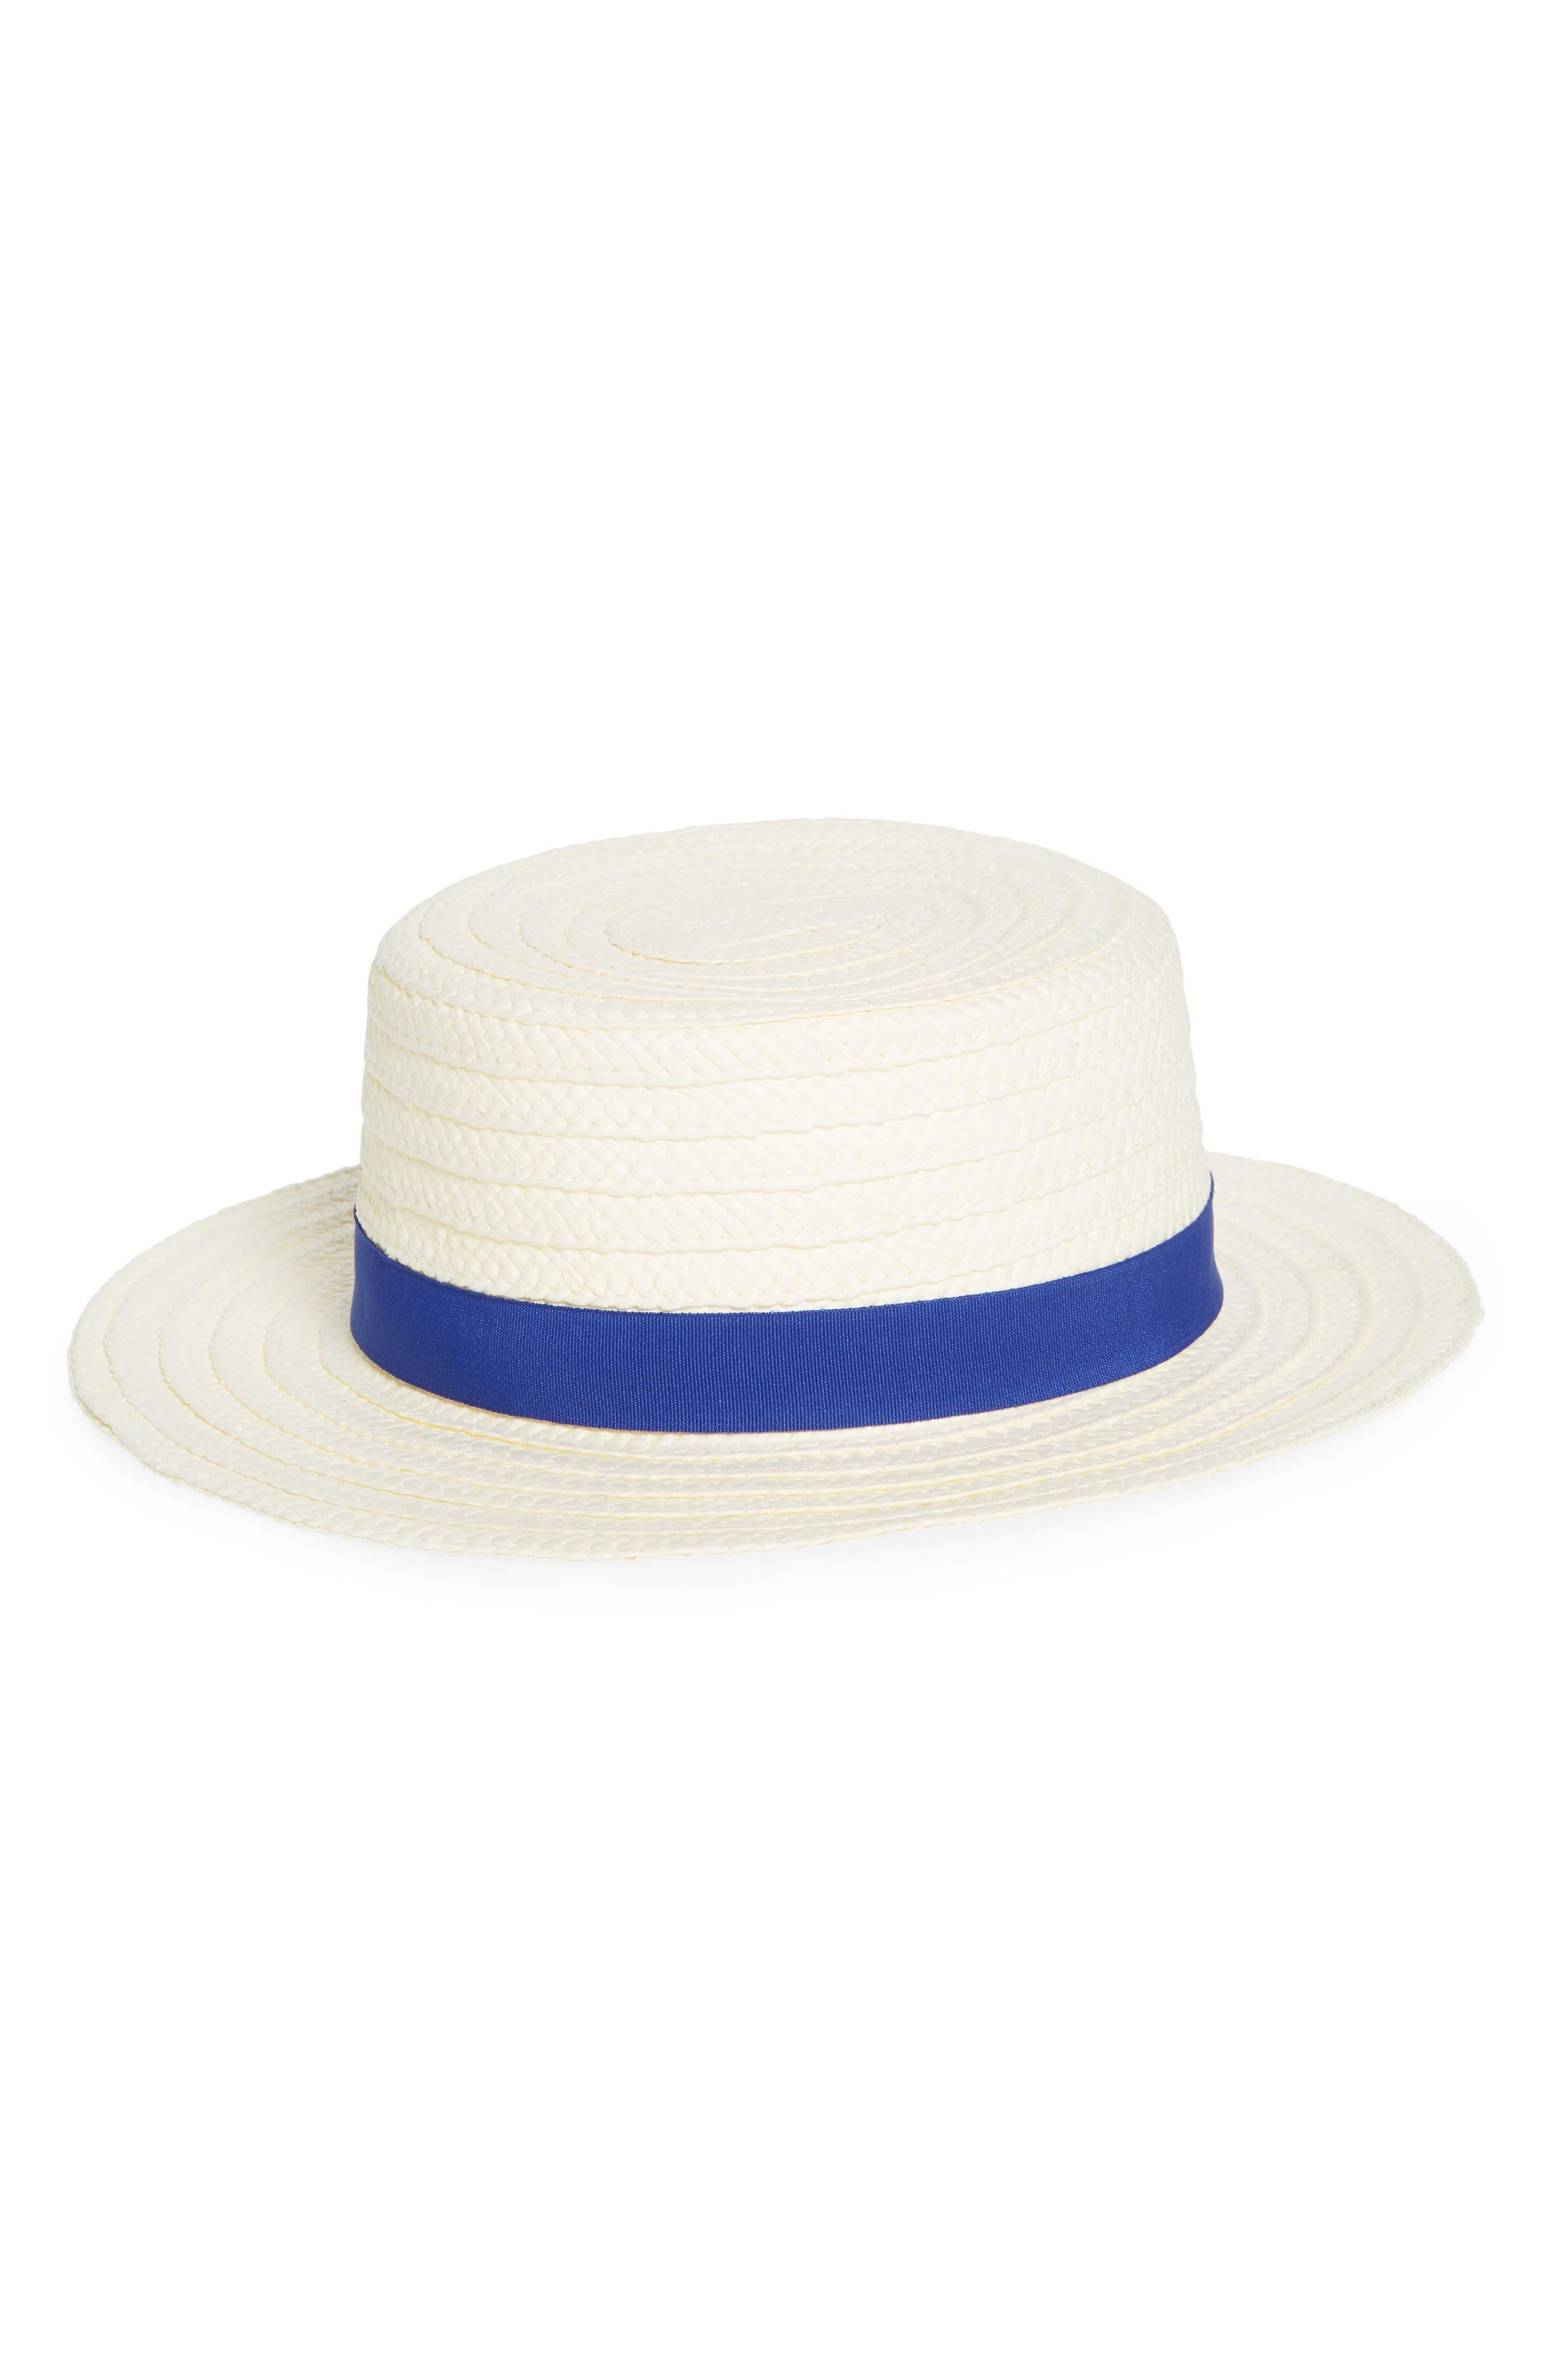 TREASURE & BOND Straw Boater Hat, Main, color, 100